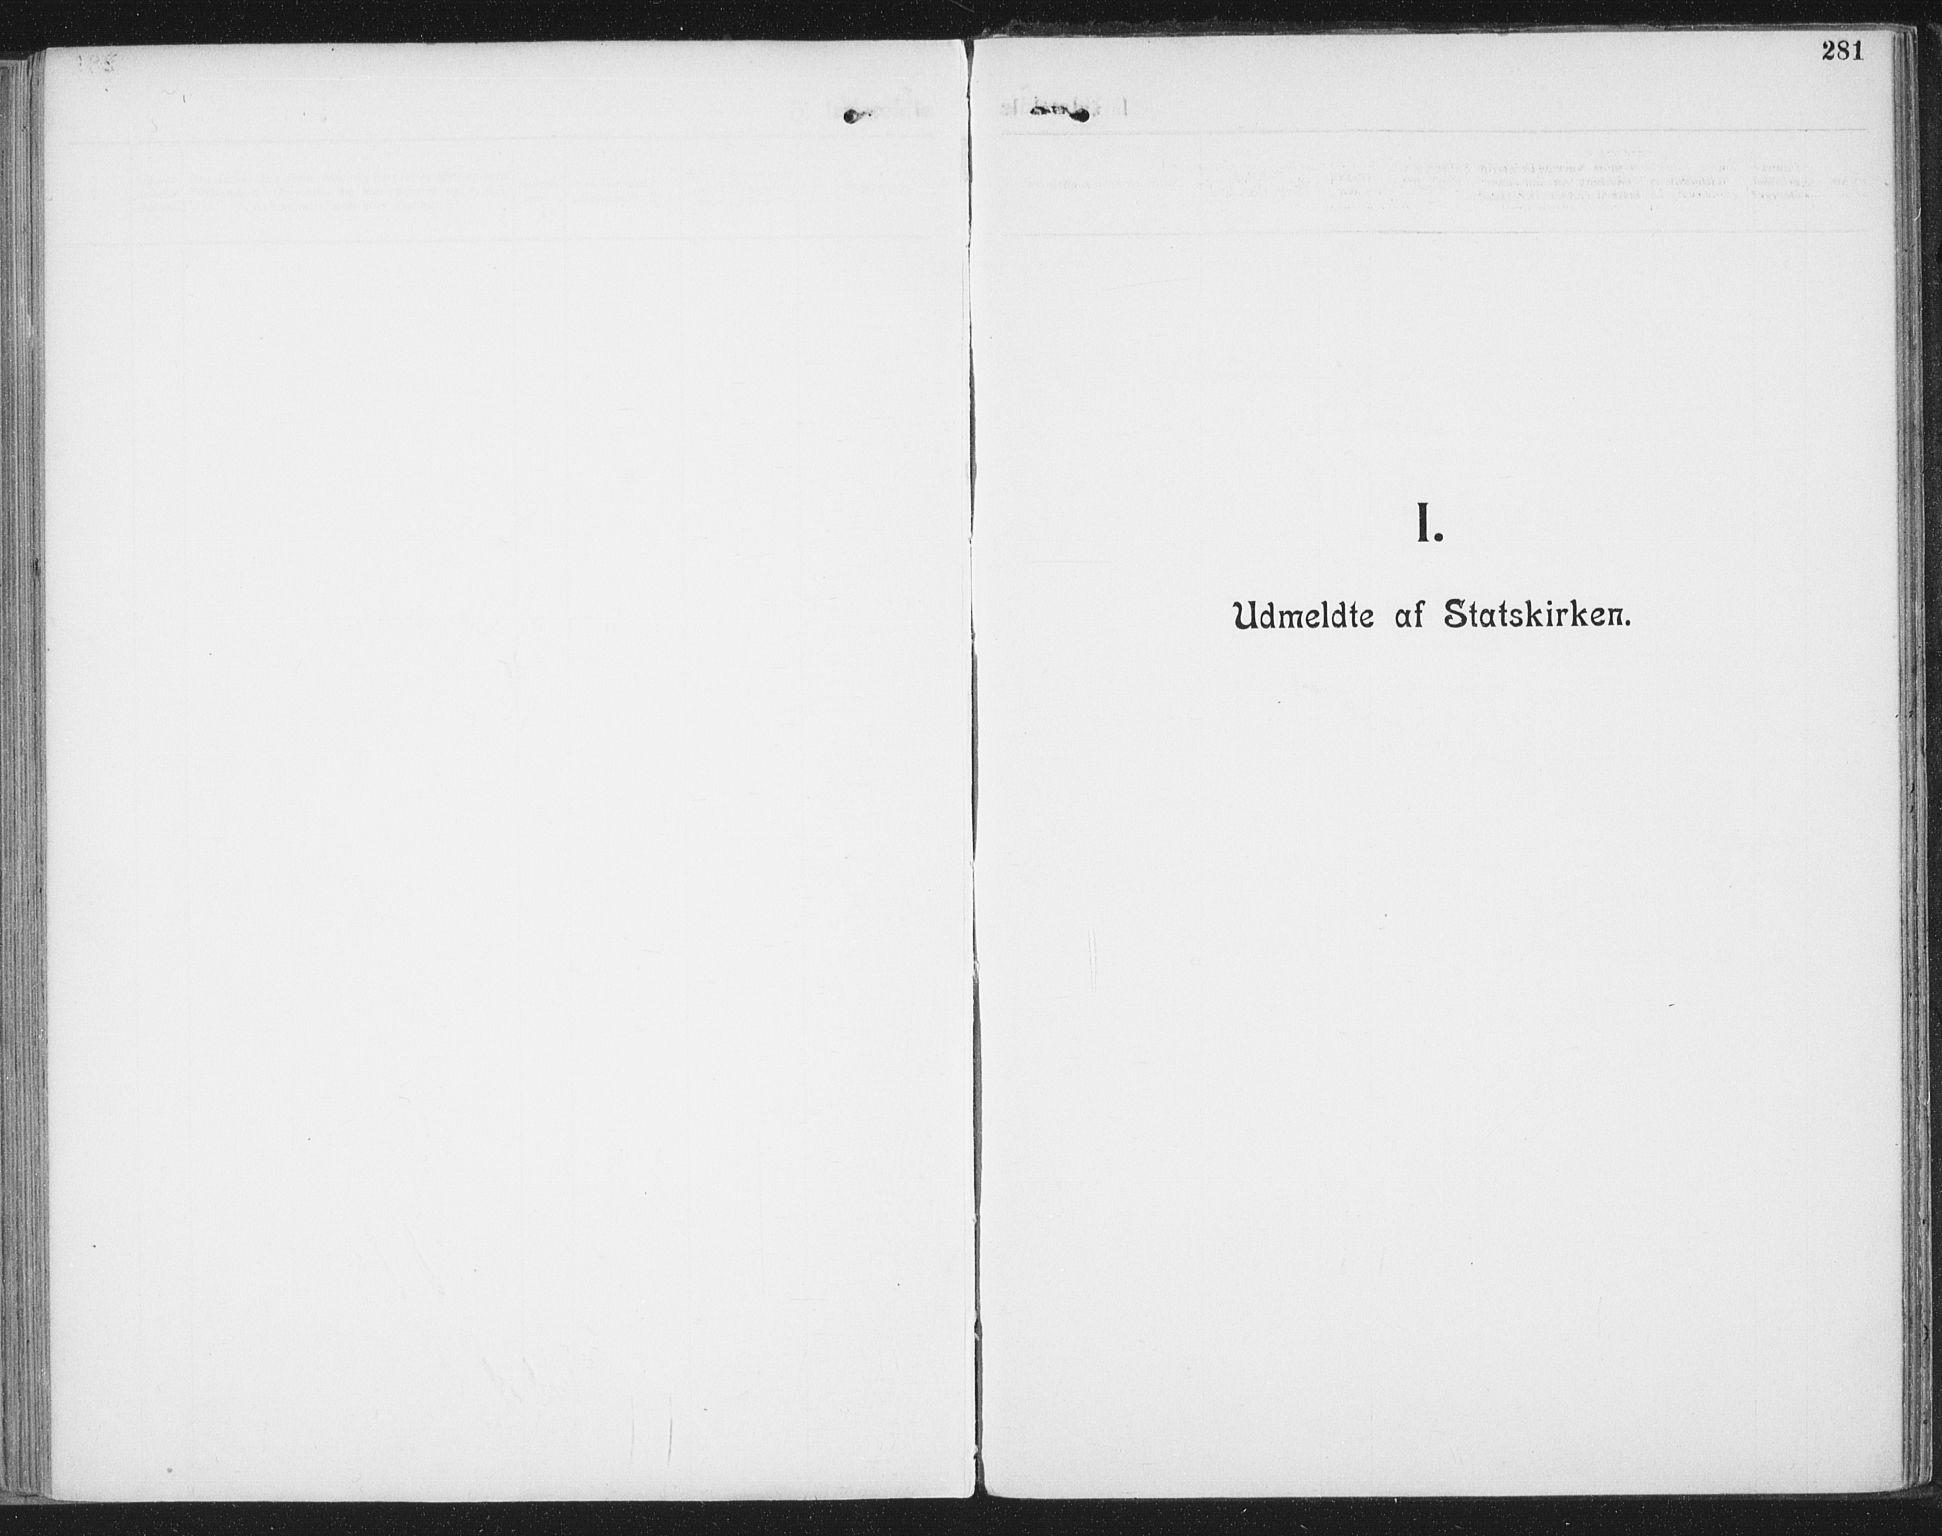 SAT, Ministerialprotokoller, klokkerbøker og fødselsregistre - Nordland, 804/L0081: Ministerialbok nr. 804A02, 1901-1915, s. 281